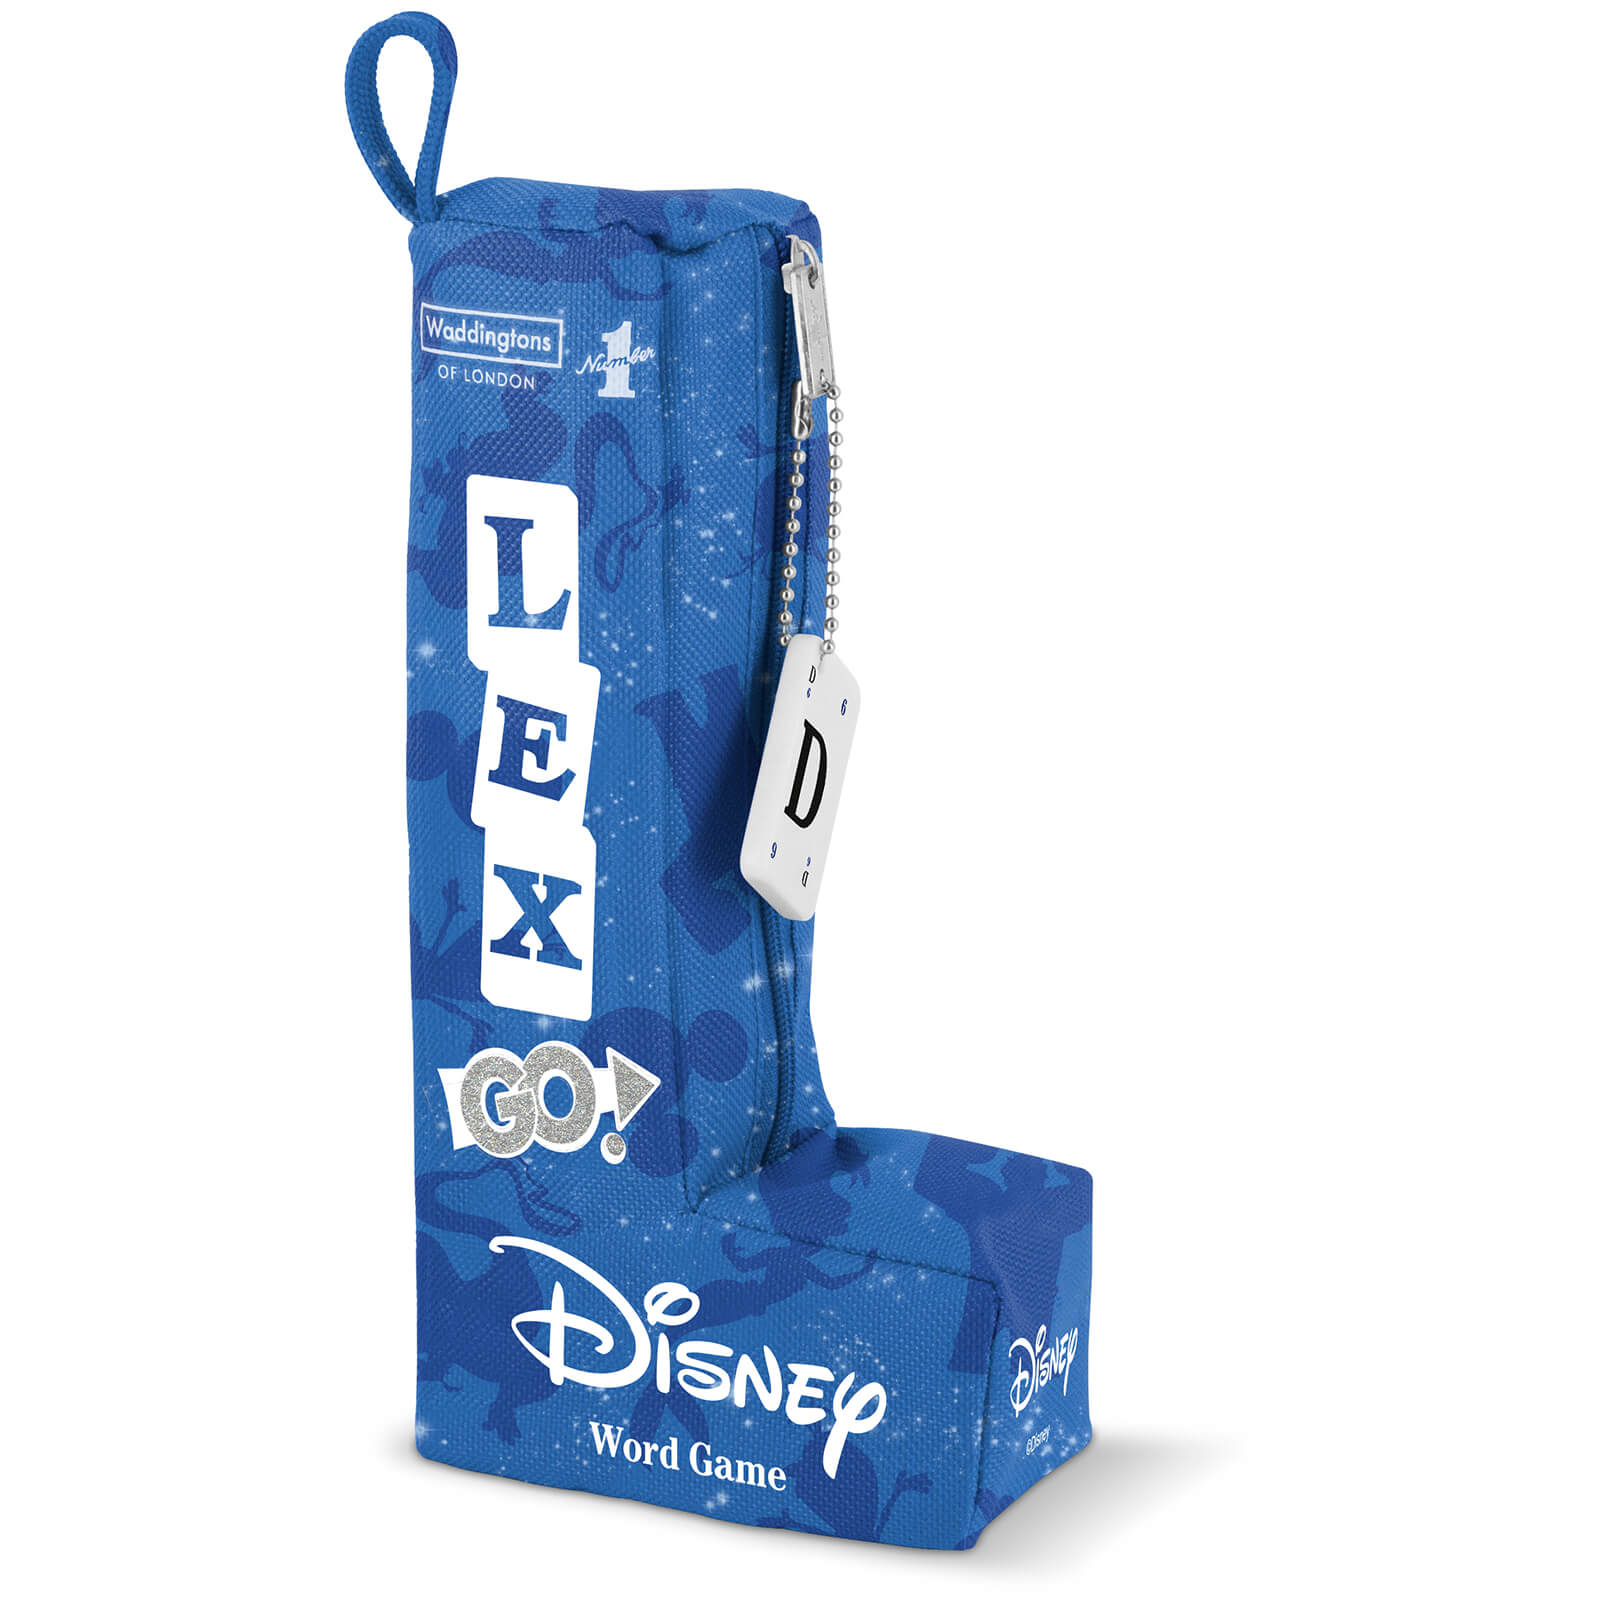 Image of LEX-GO! Word Game - Disney Edition